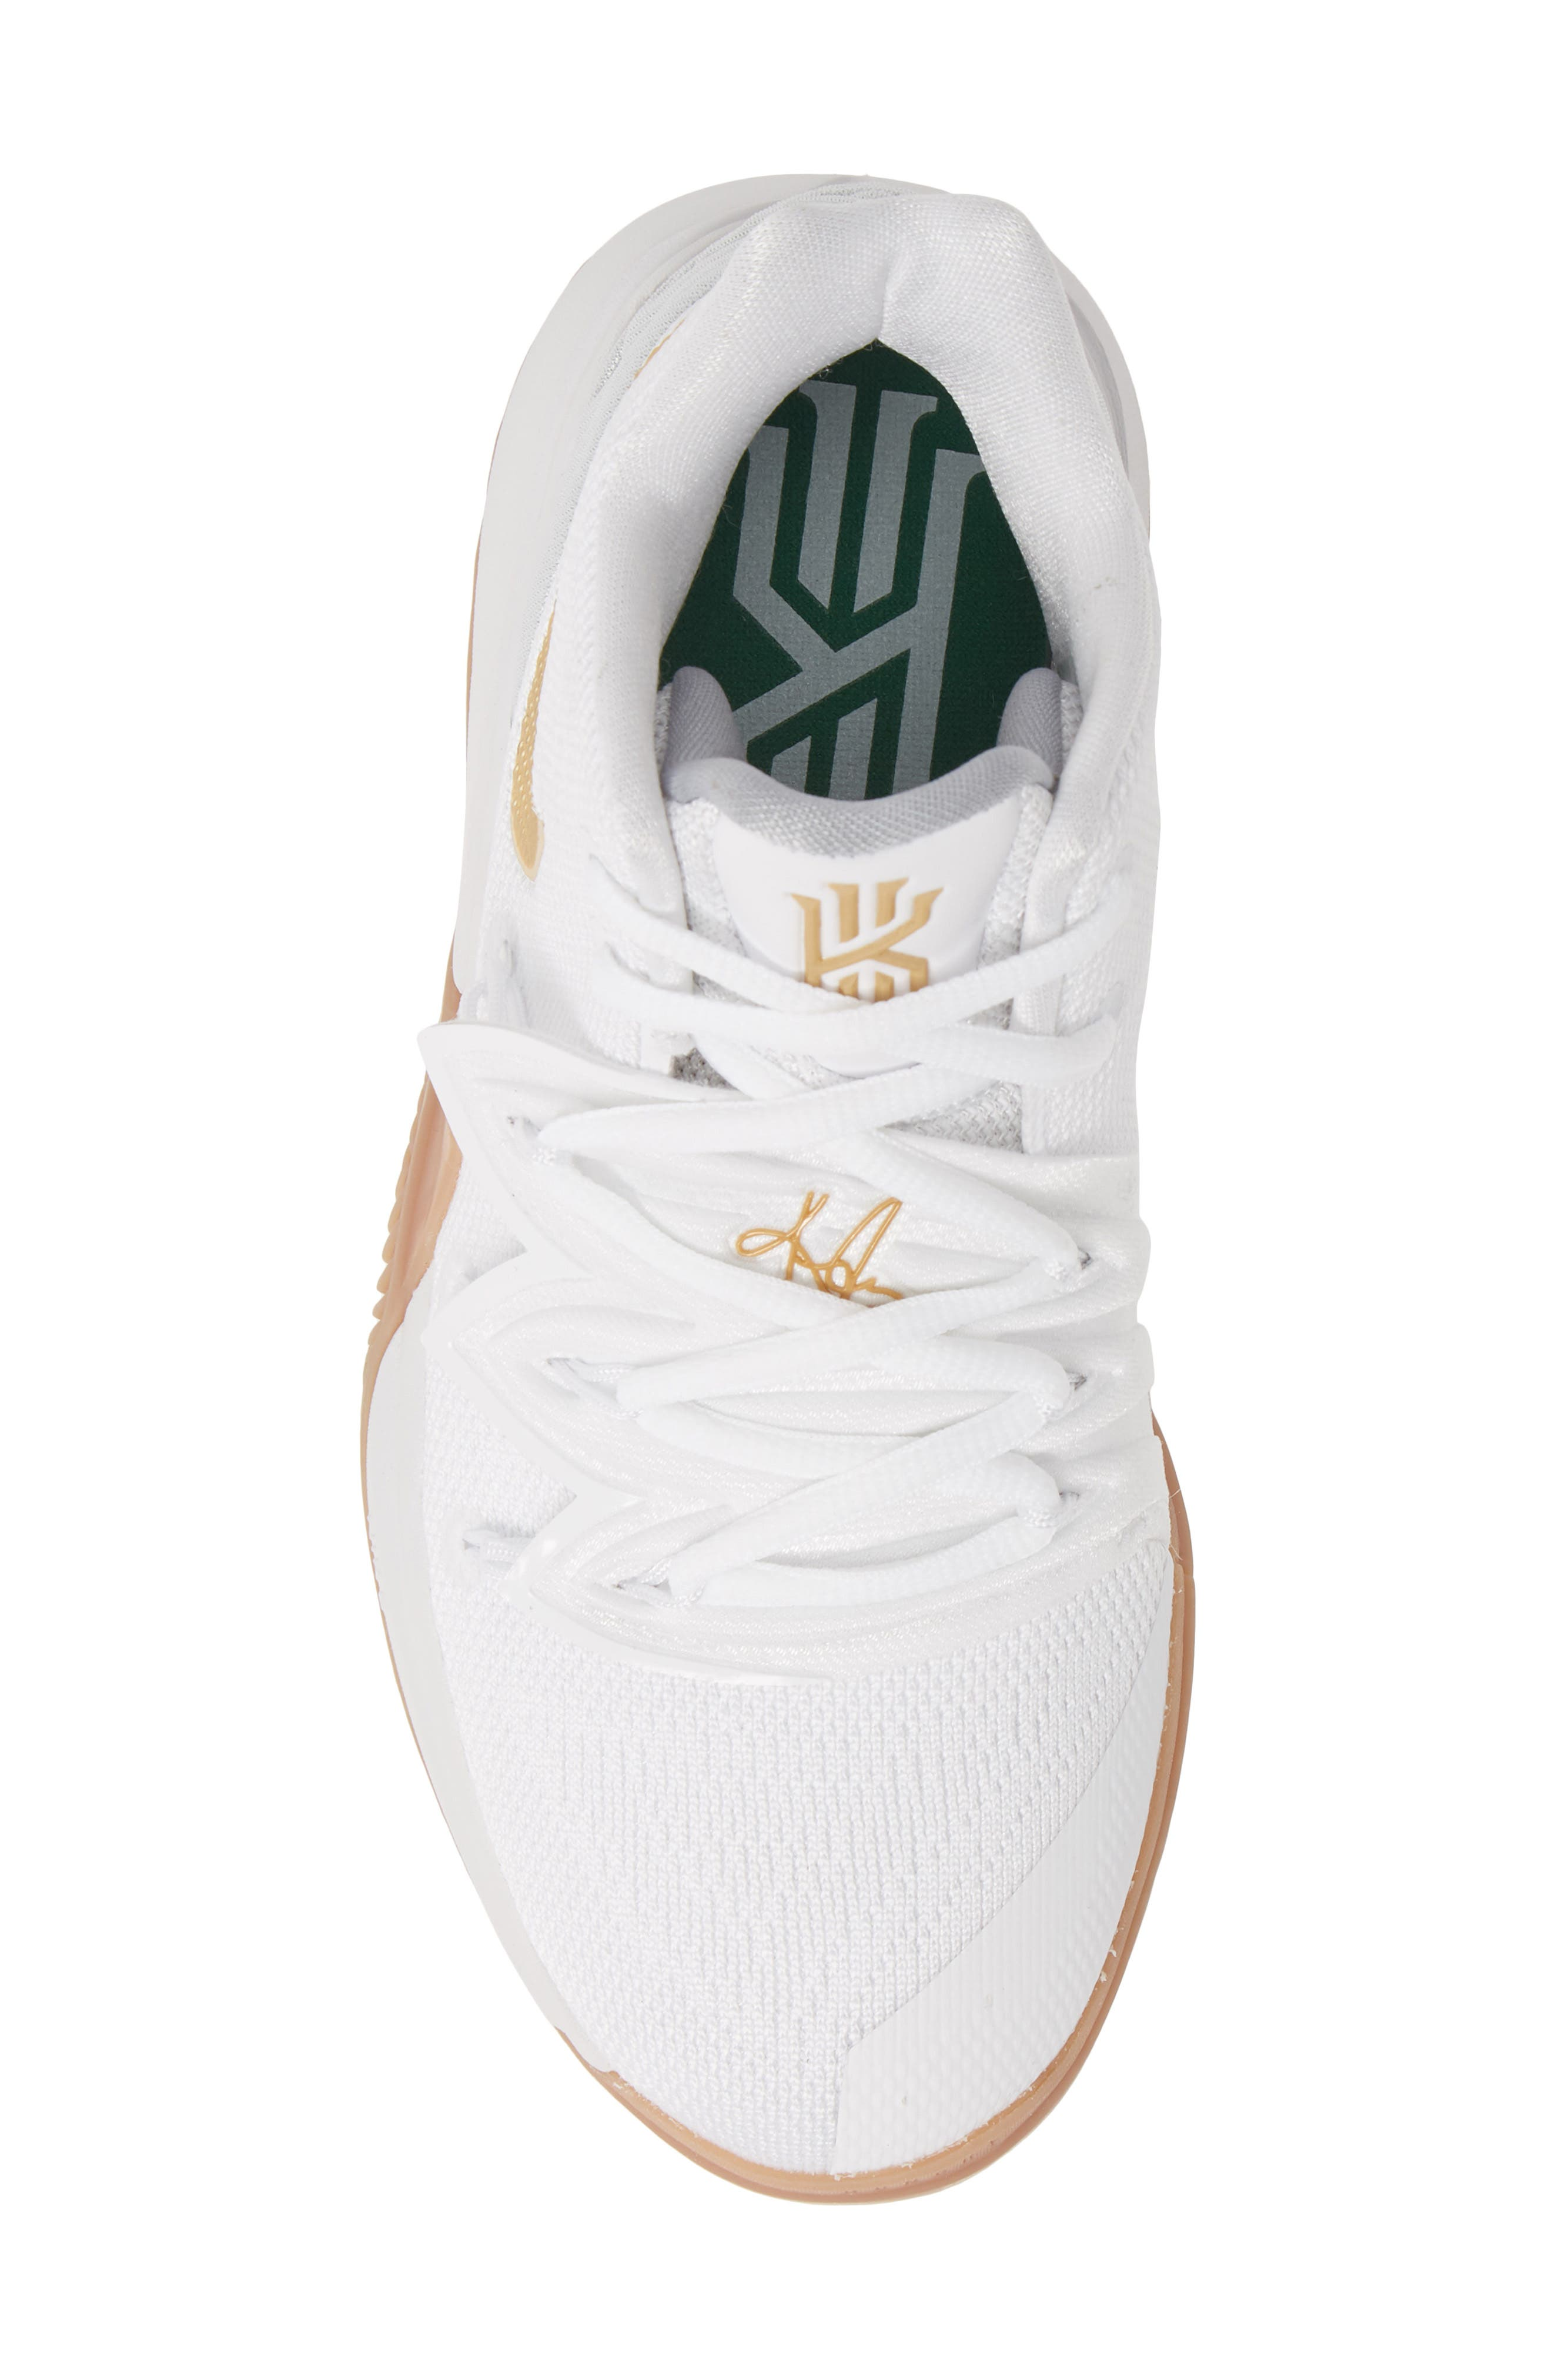 NIKE, Kyrie 5 Basketball Shoe, Alternate thumbnail 5, color, WHITE/ METALLIC GOLD-PLATINUM